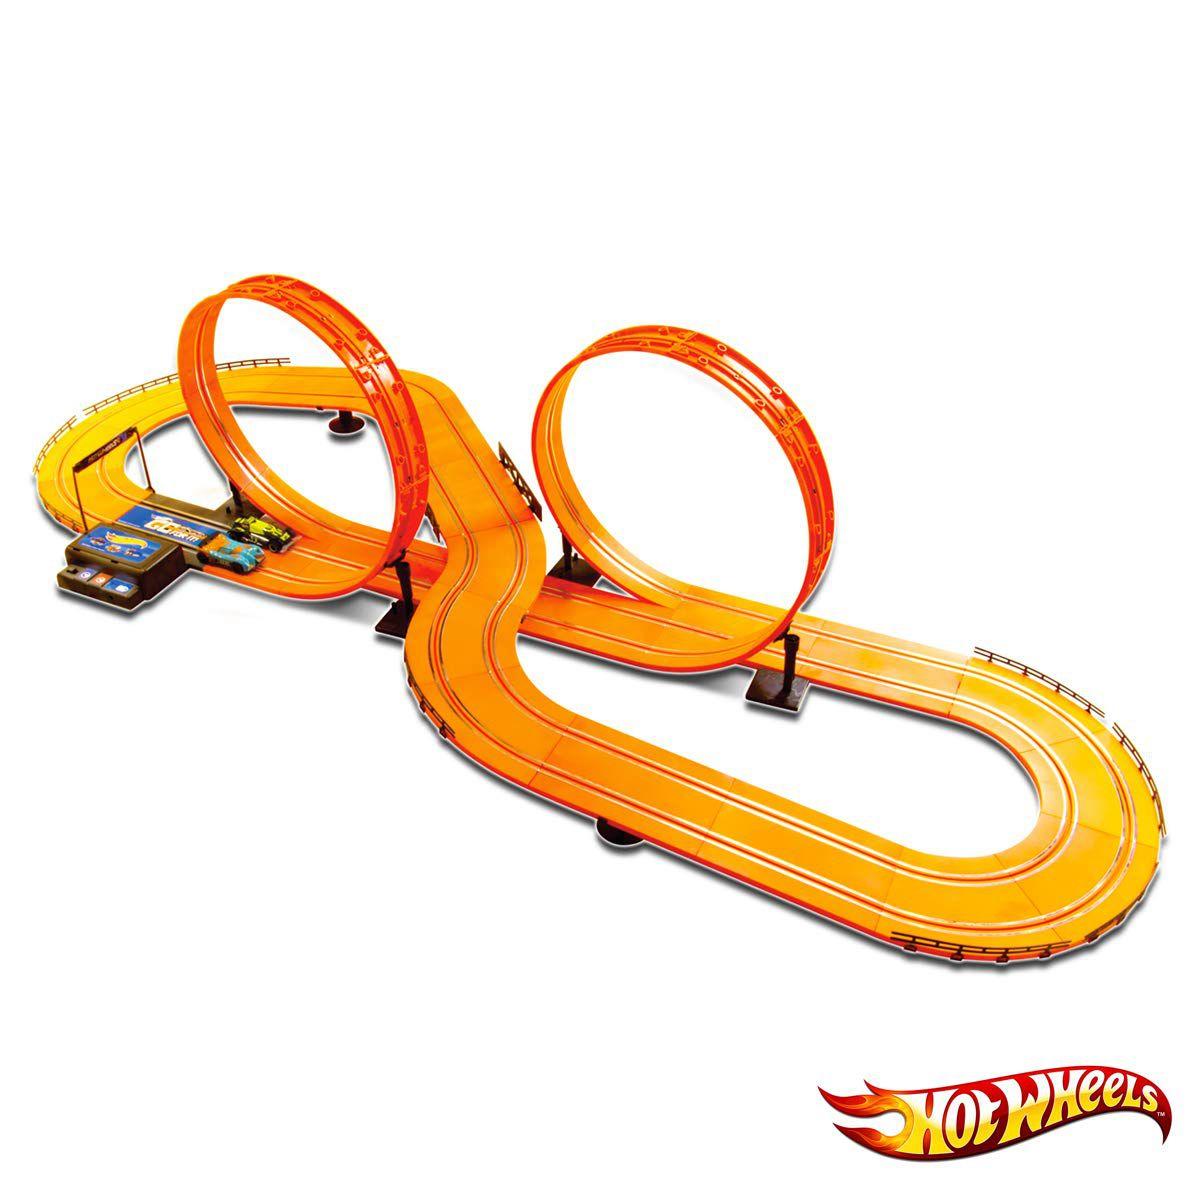 Pista Hot Wheels Track Set Deluxe 632cm Multikids